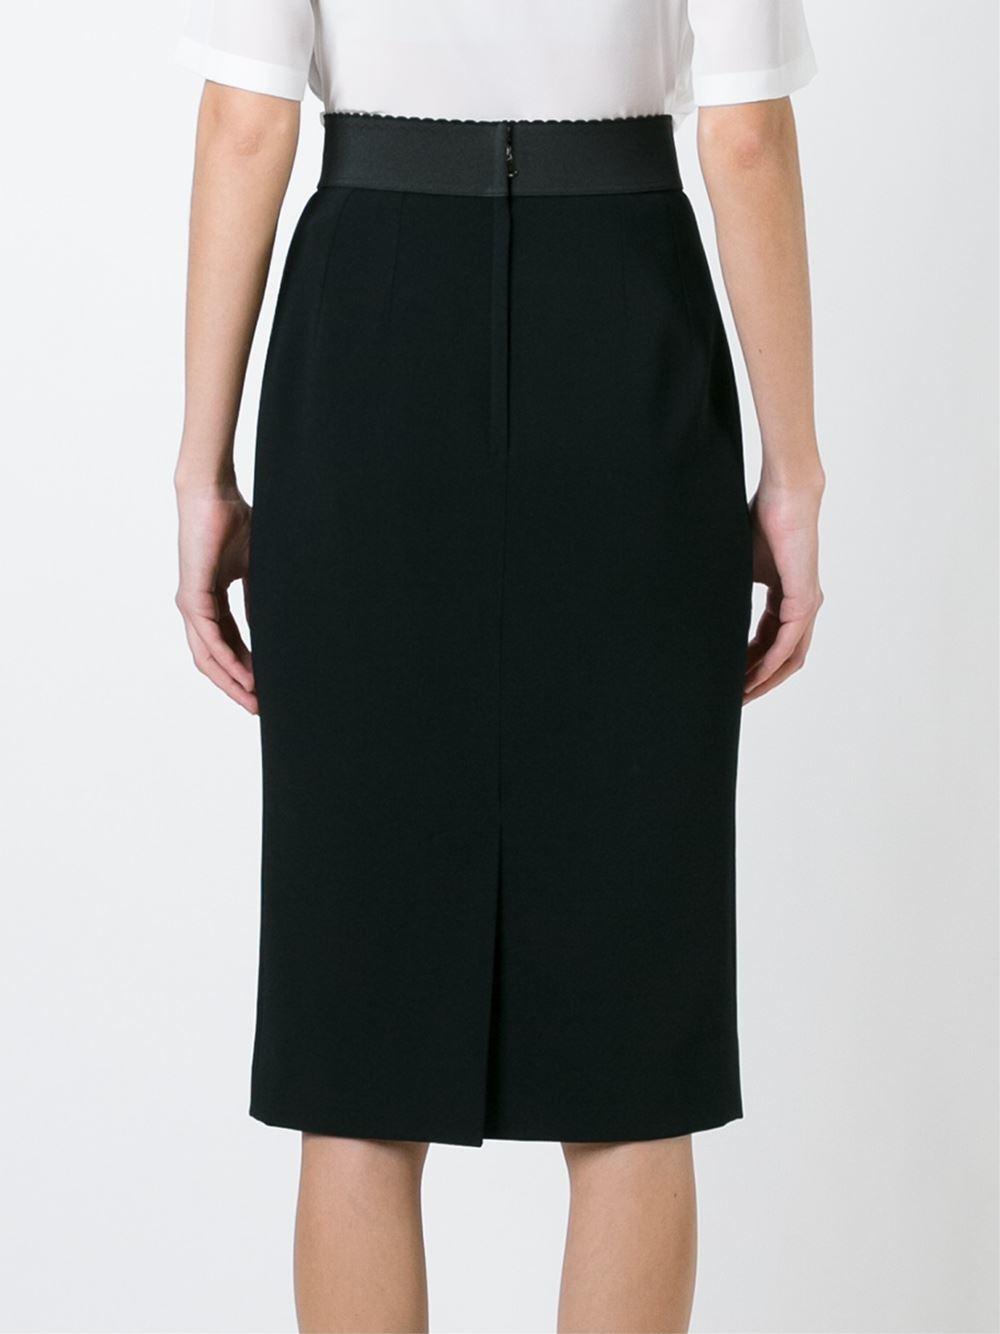 dolce gabbana classic pencil skirt in black lyst